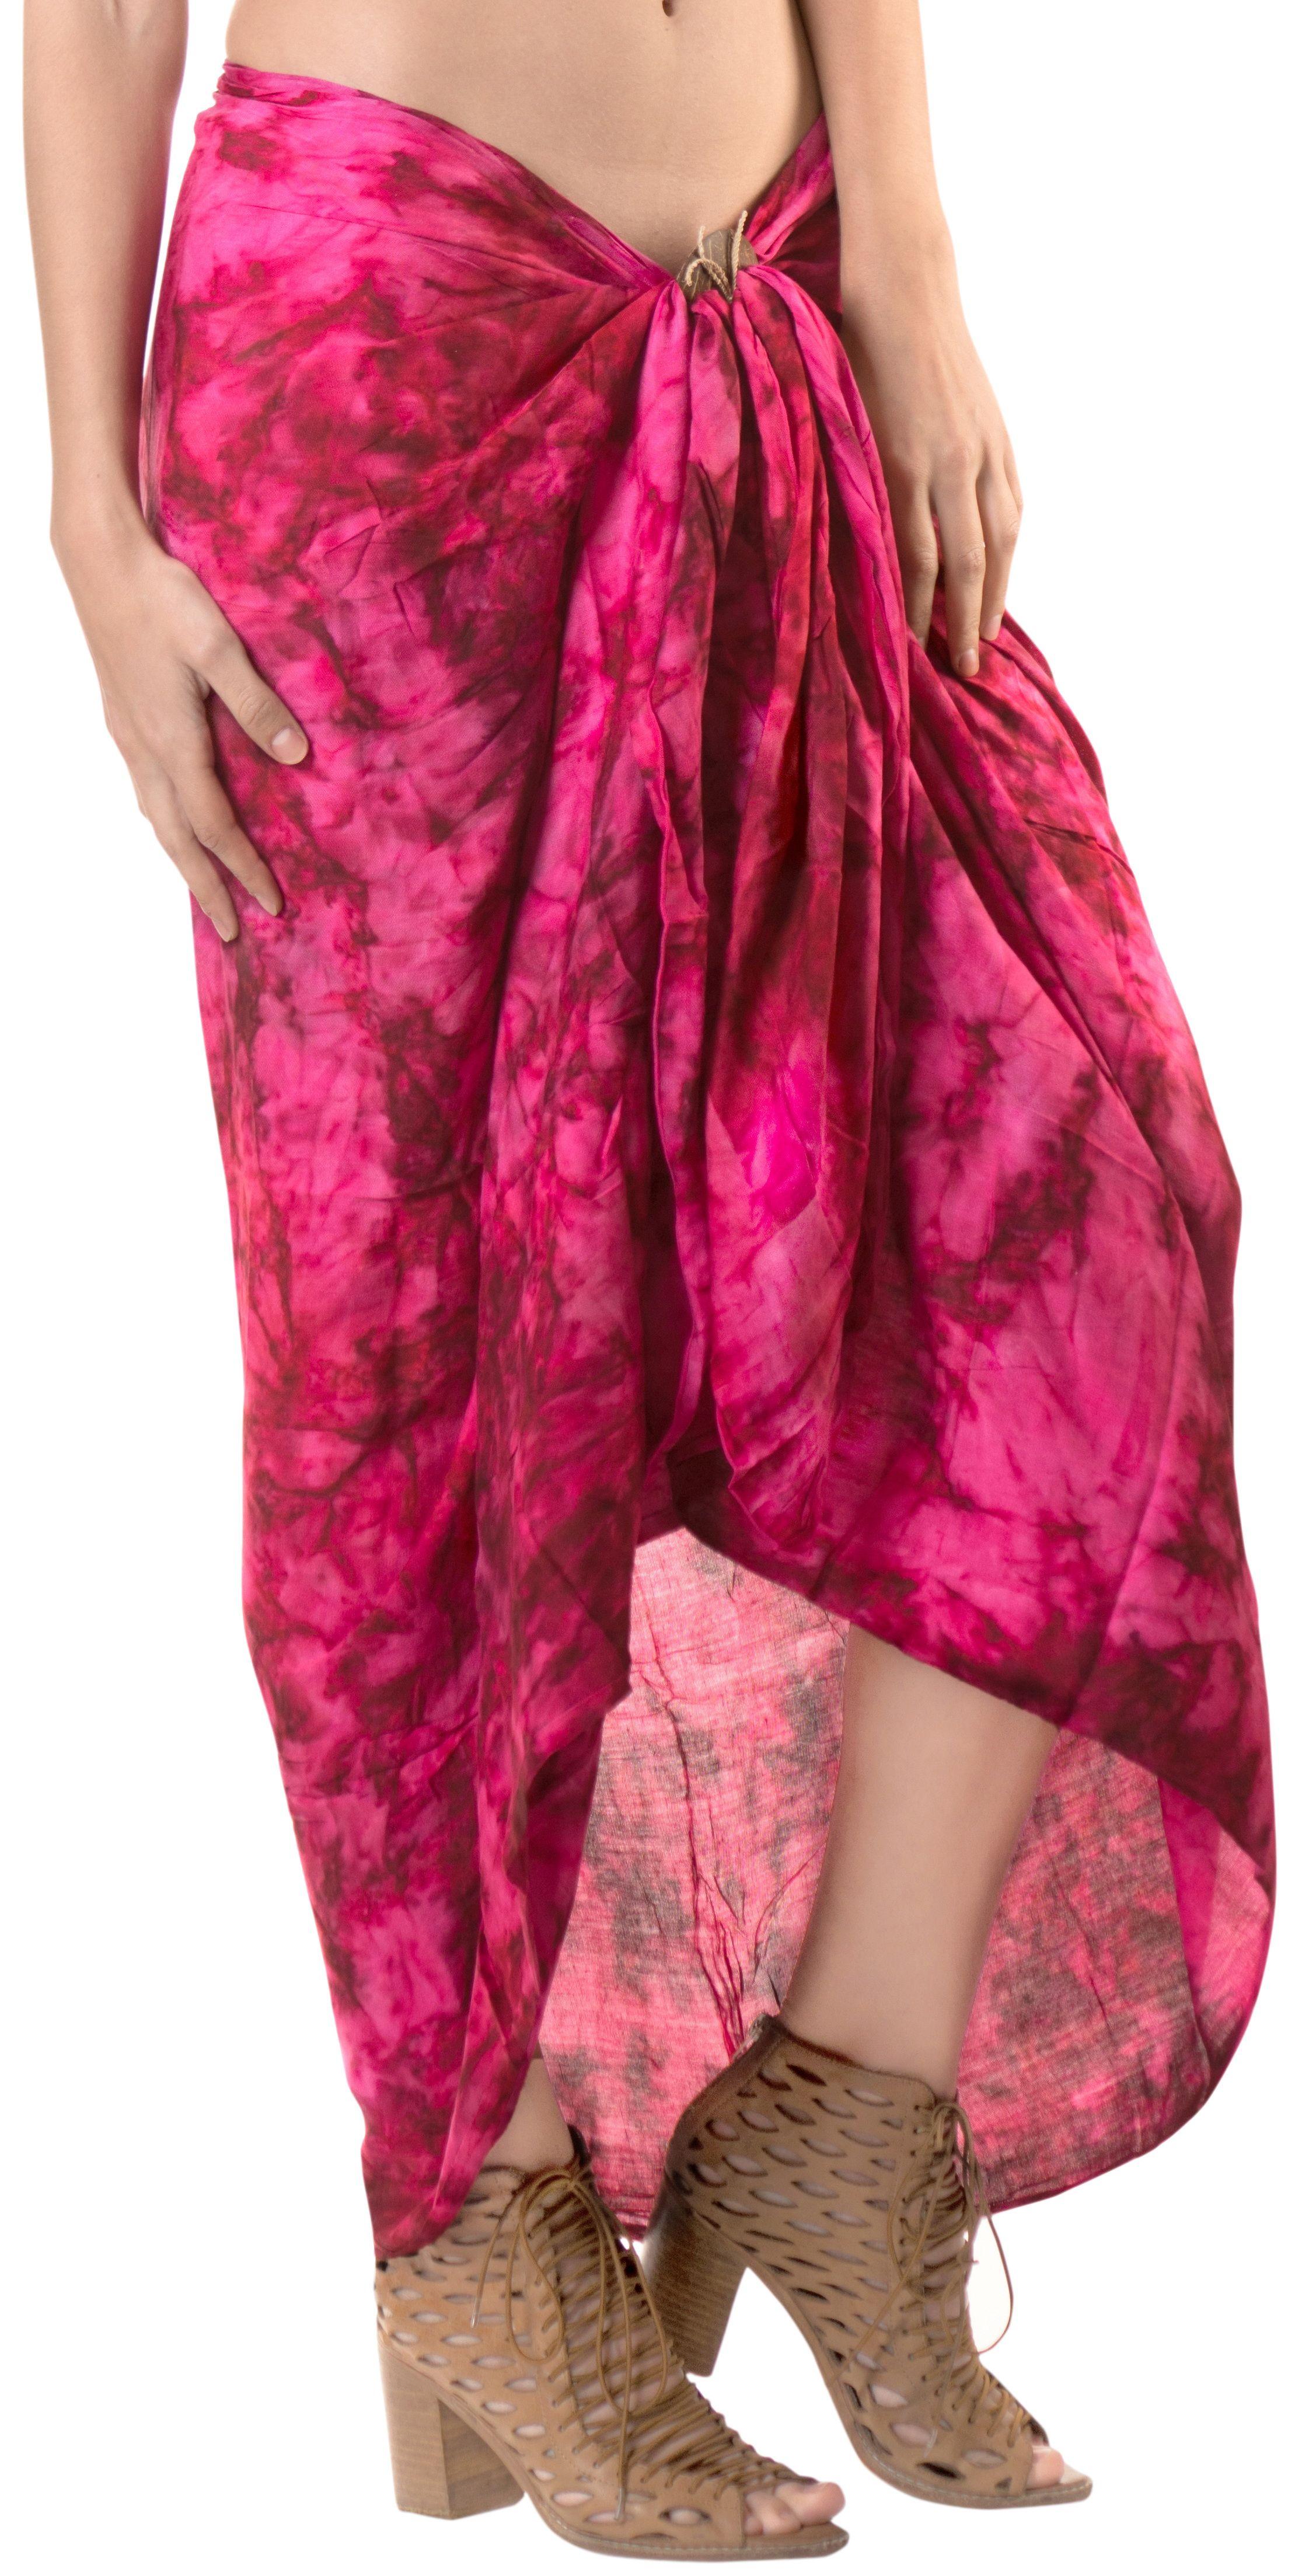 21f2113a3f LA LEELA BEACH Rayon Casual WOMEN Bikini Scarf Wrap Long Sarong Swimsuit  Pareo#Rayon, #Casual, #WOMEN